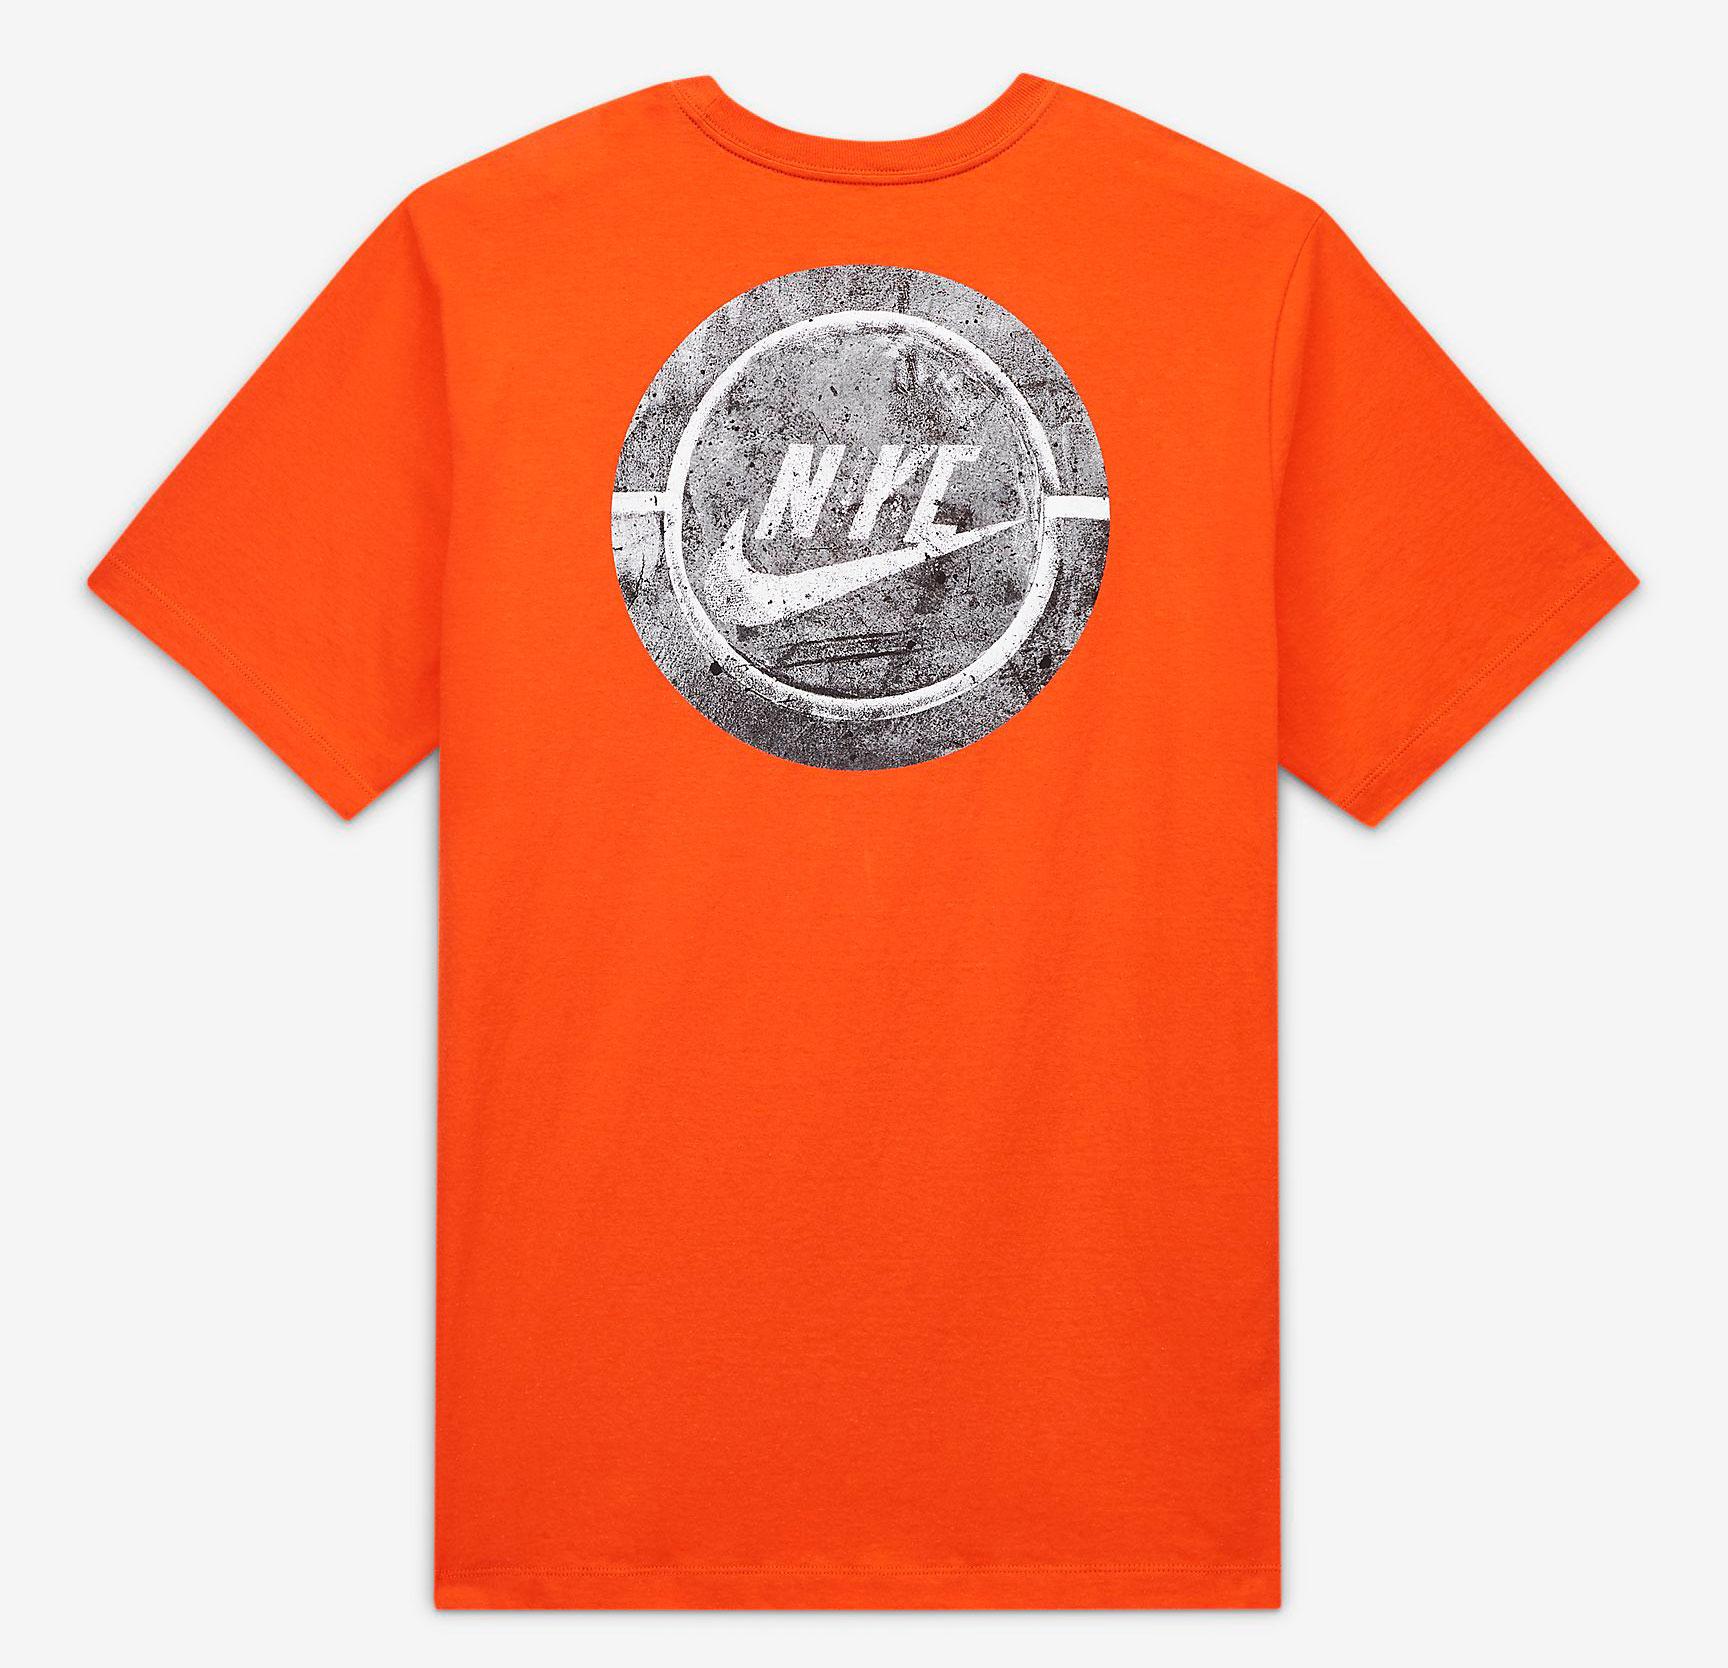 nike-air-foamposite-one-rugged-orange-matching-shirt-2